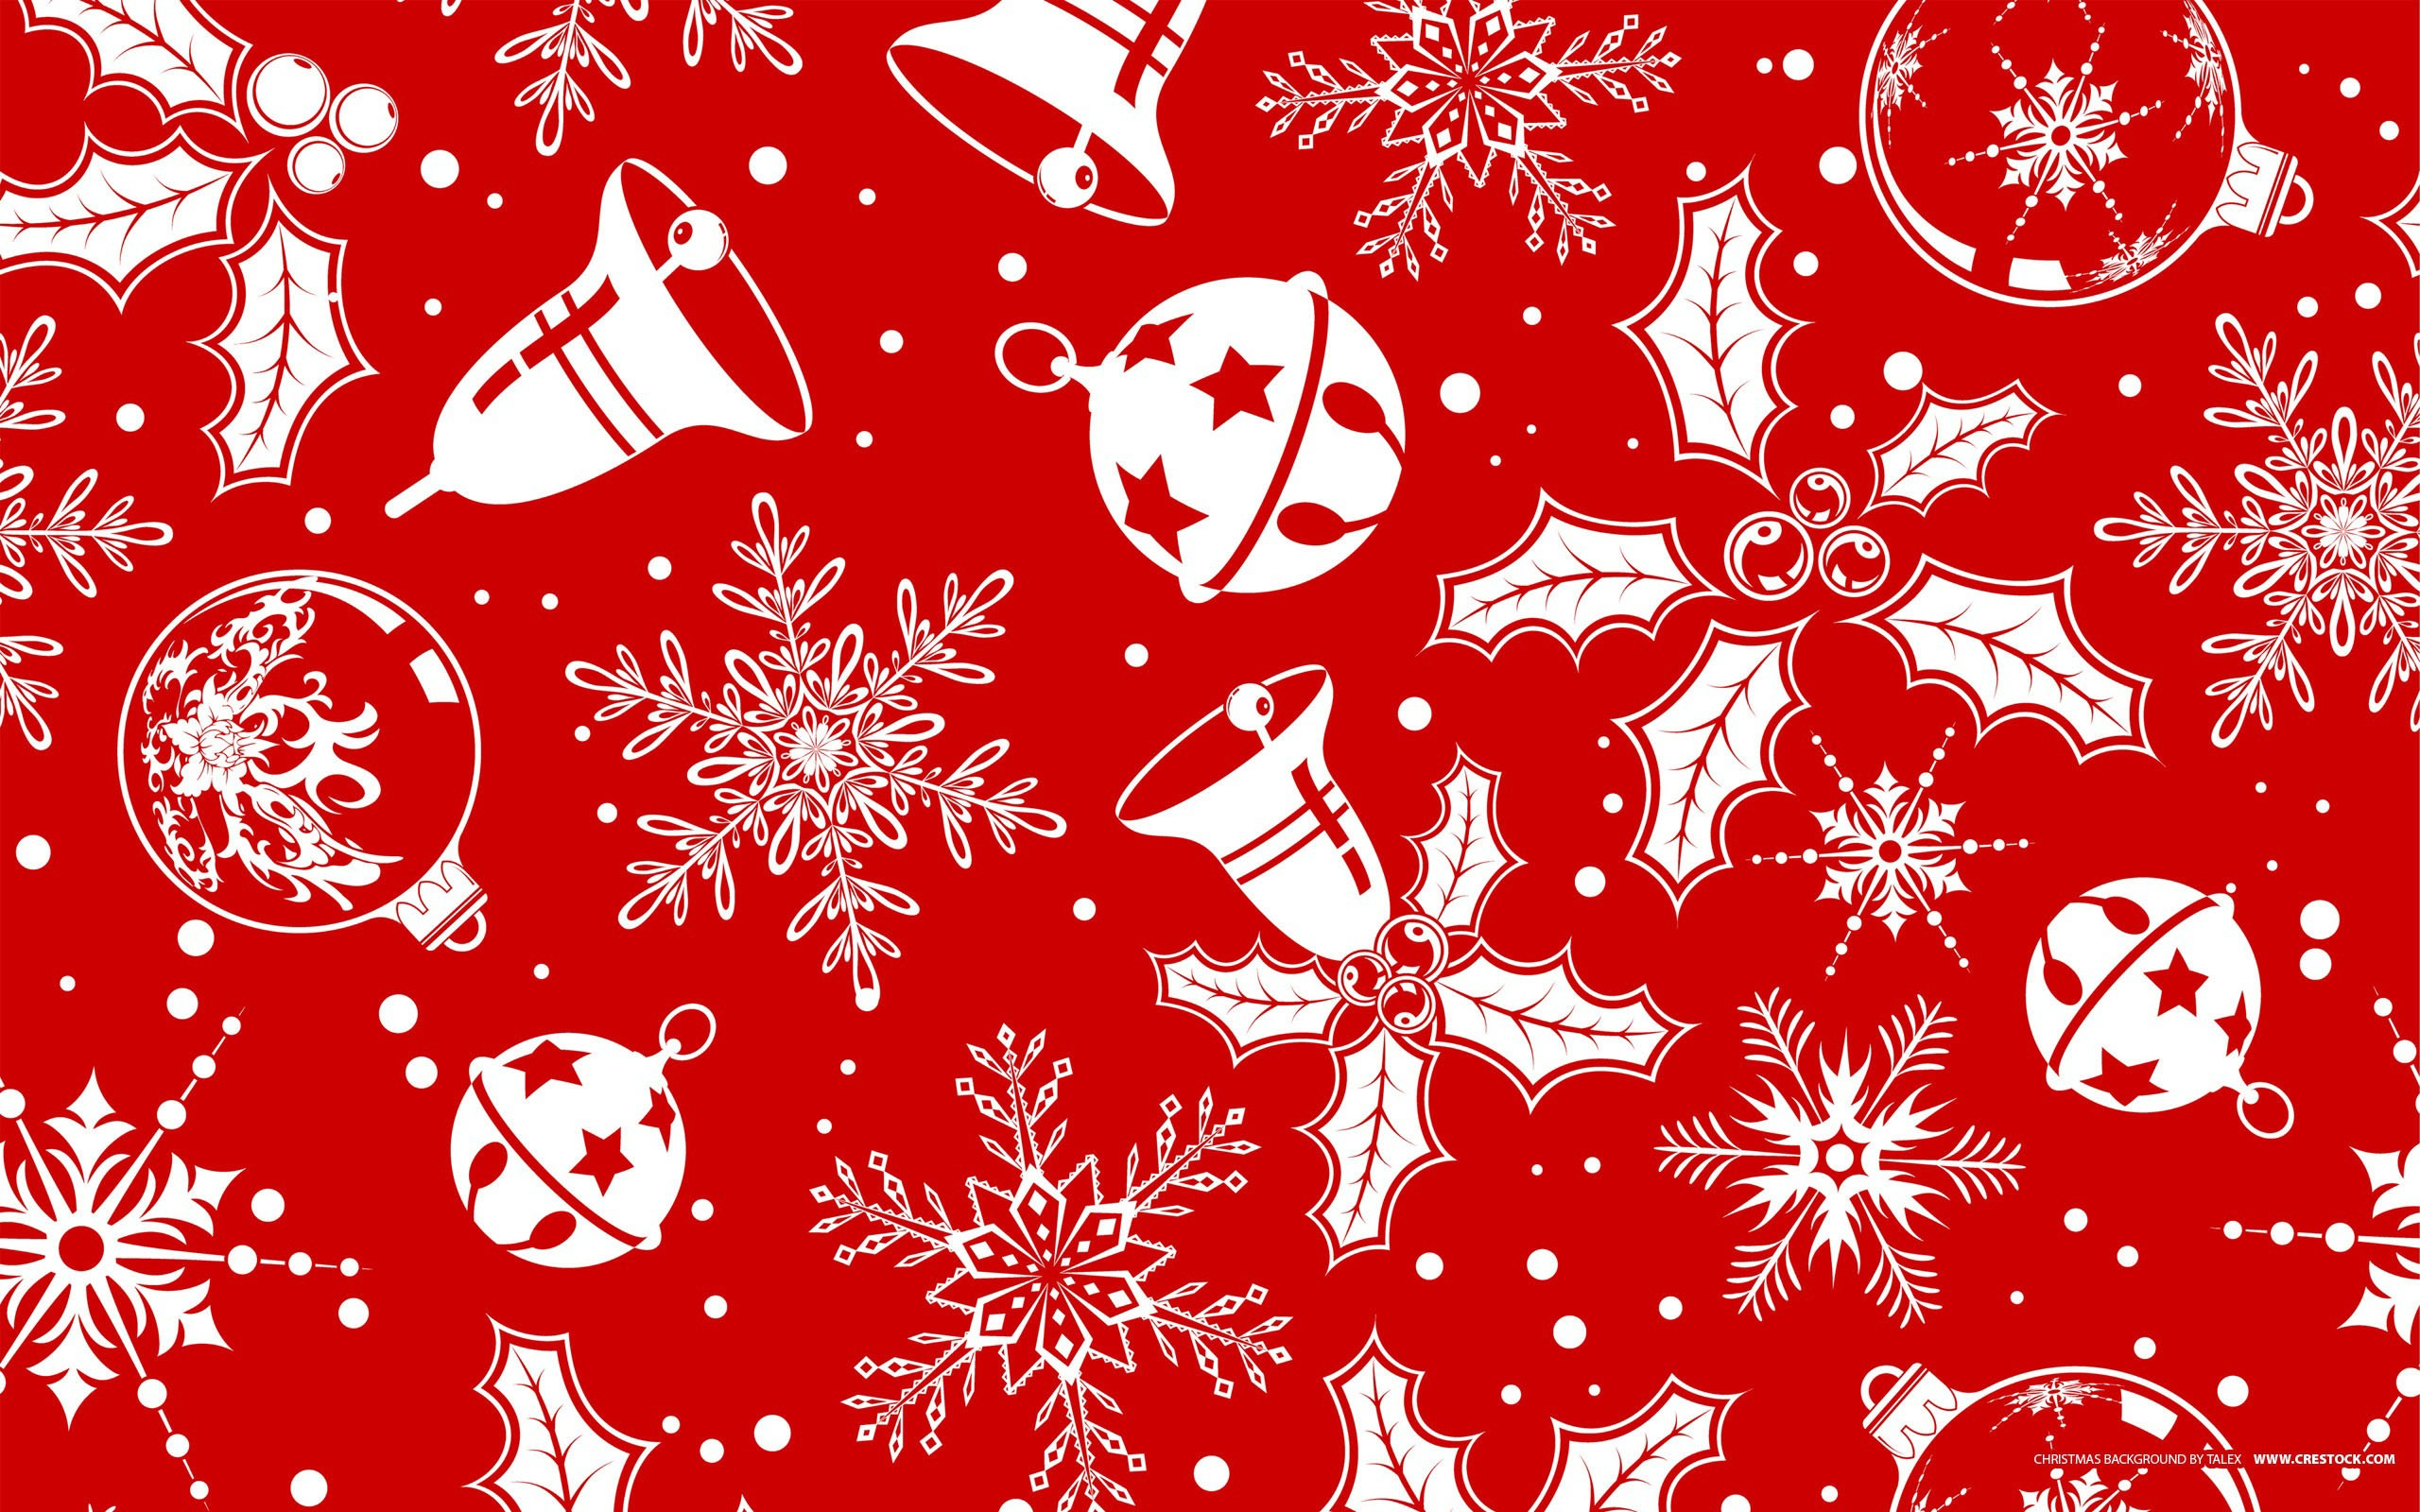 Christmas Wallpaper Tumblr.Christmas Wallpaper Tumblr Download Free Amazing